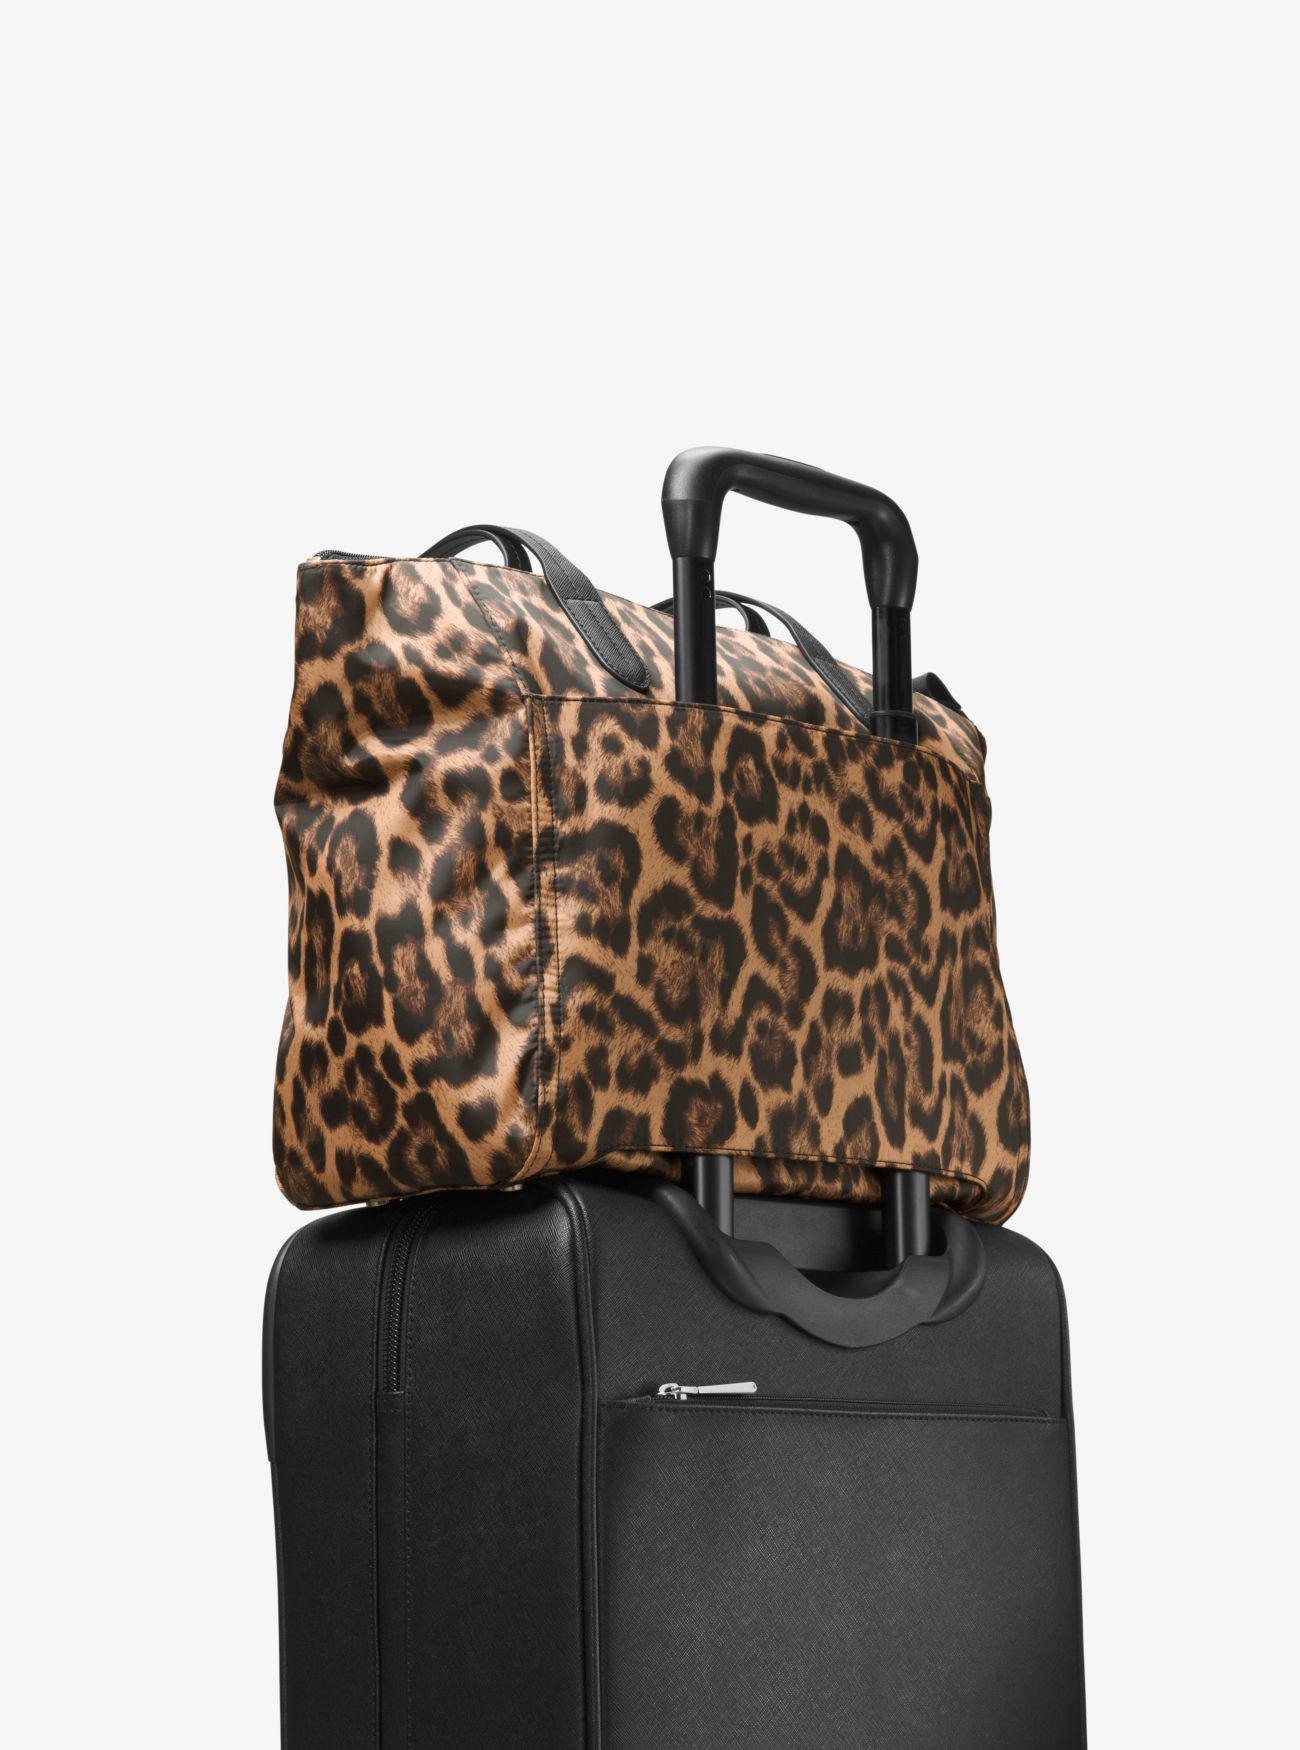 12234cf87a38 Lyst - Michael Kors Kelsey Leopard Nylon Tote